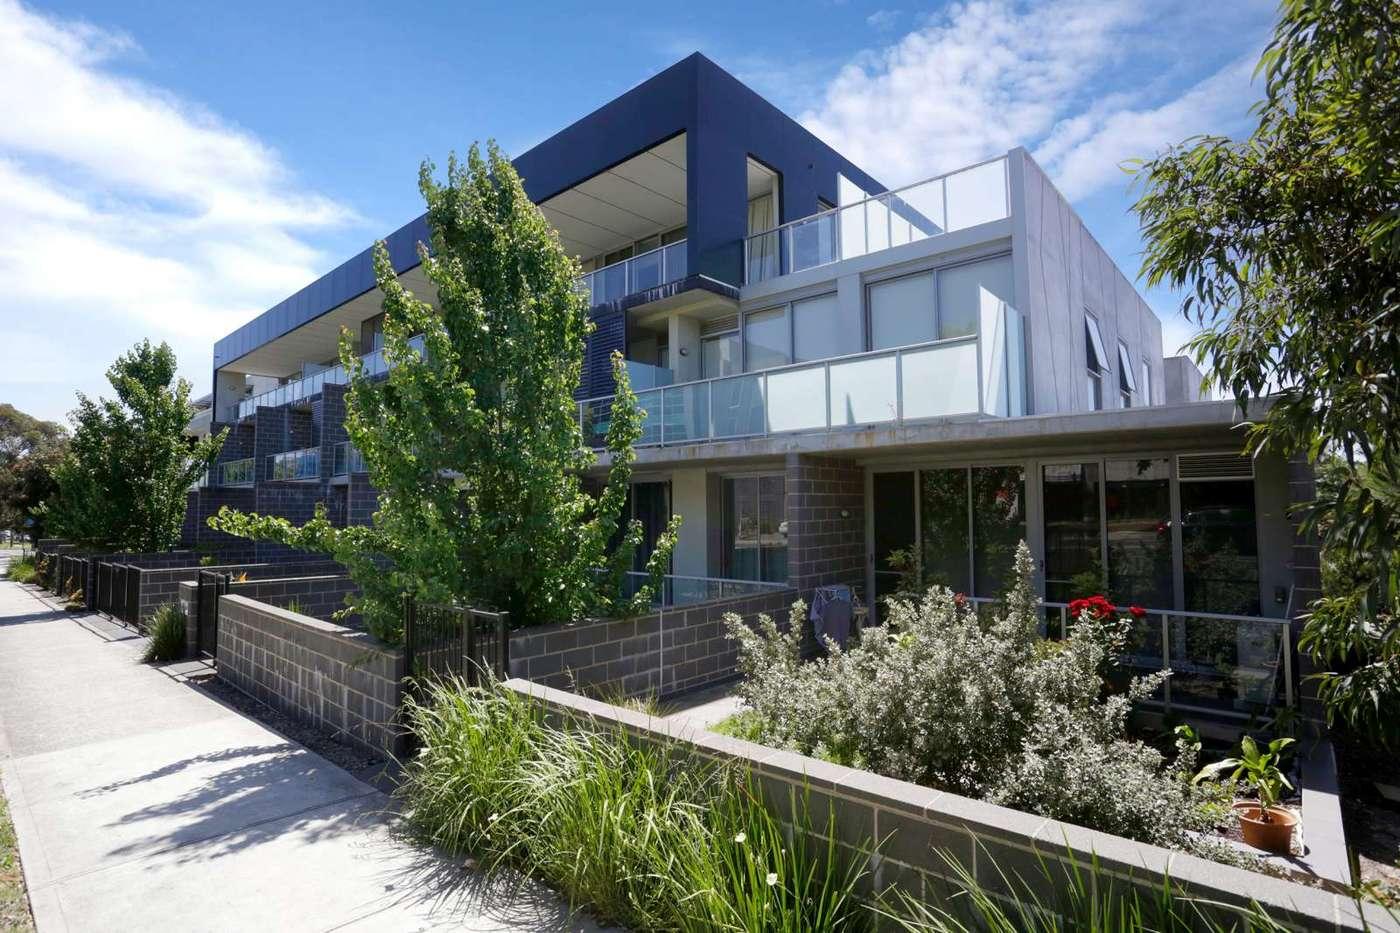 Main view of Homely apartment listing, 205/286-290 Blackburn Rd, Glen Waverley, VIC 3150